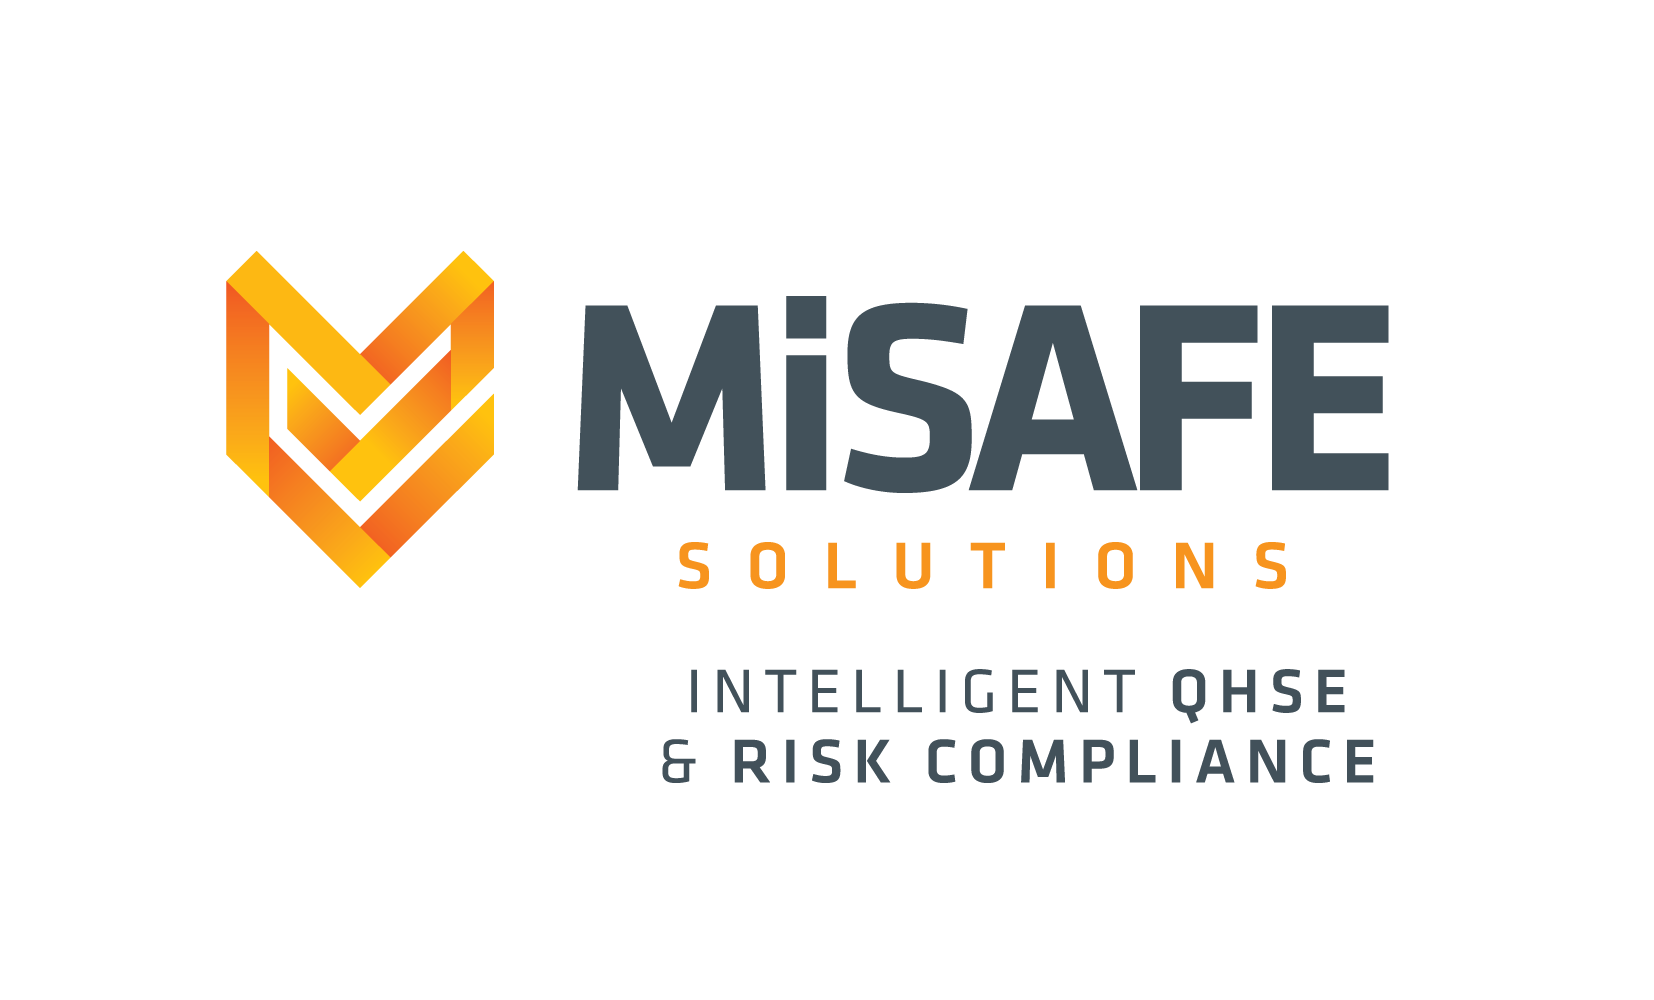 MiSafe